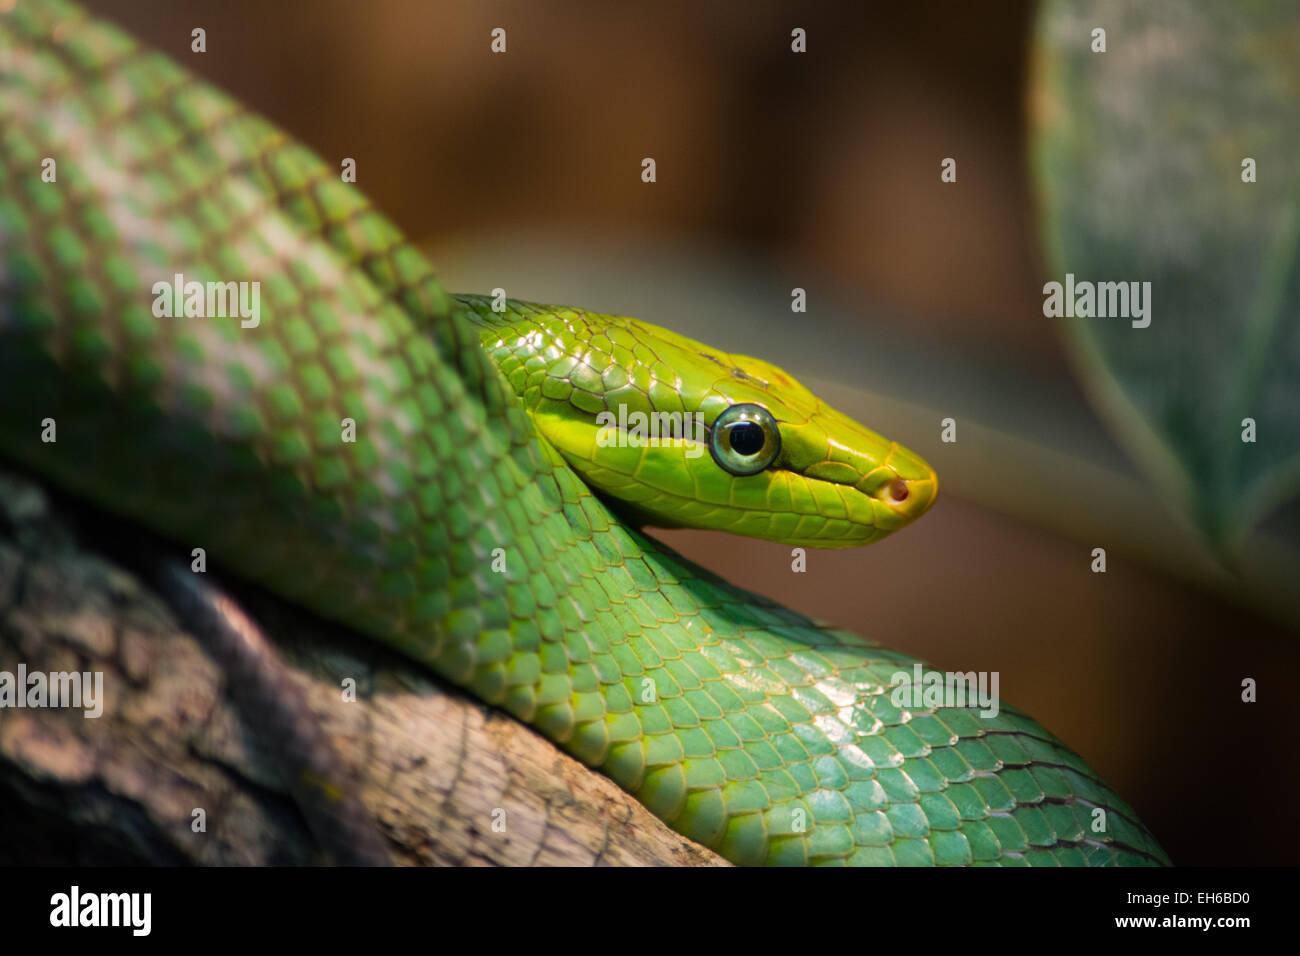 Green tree snake sitting on root - Stock Image